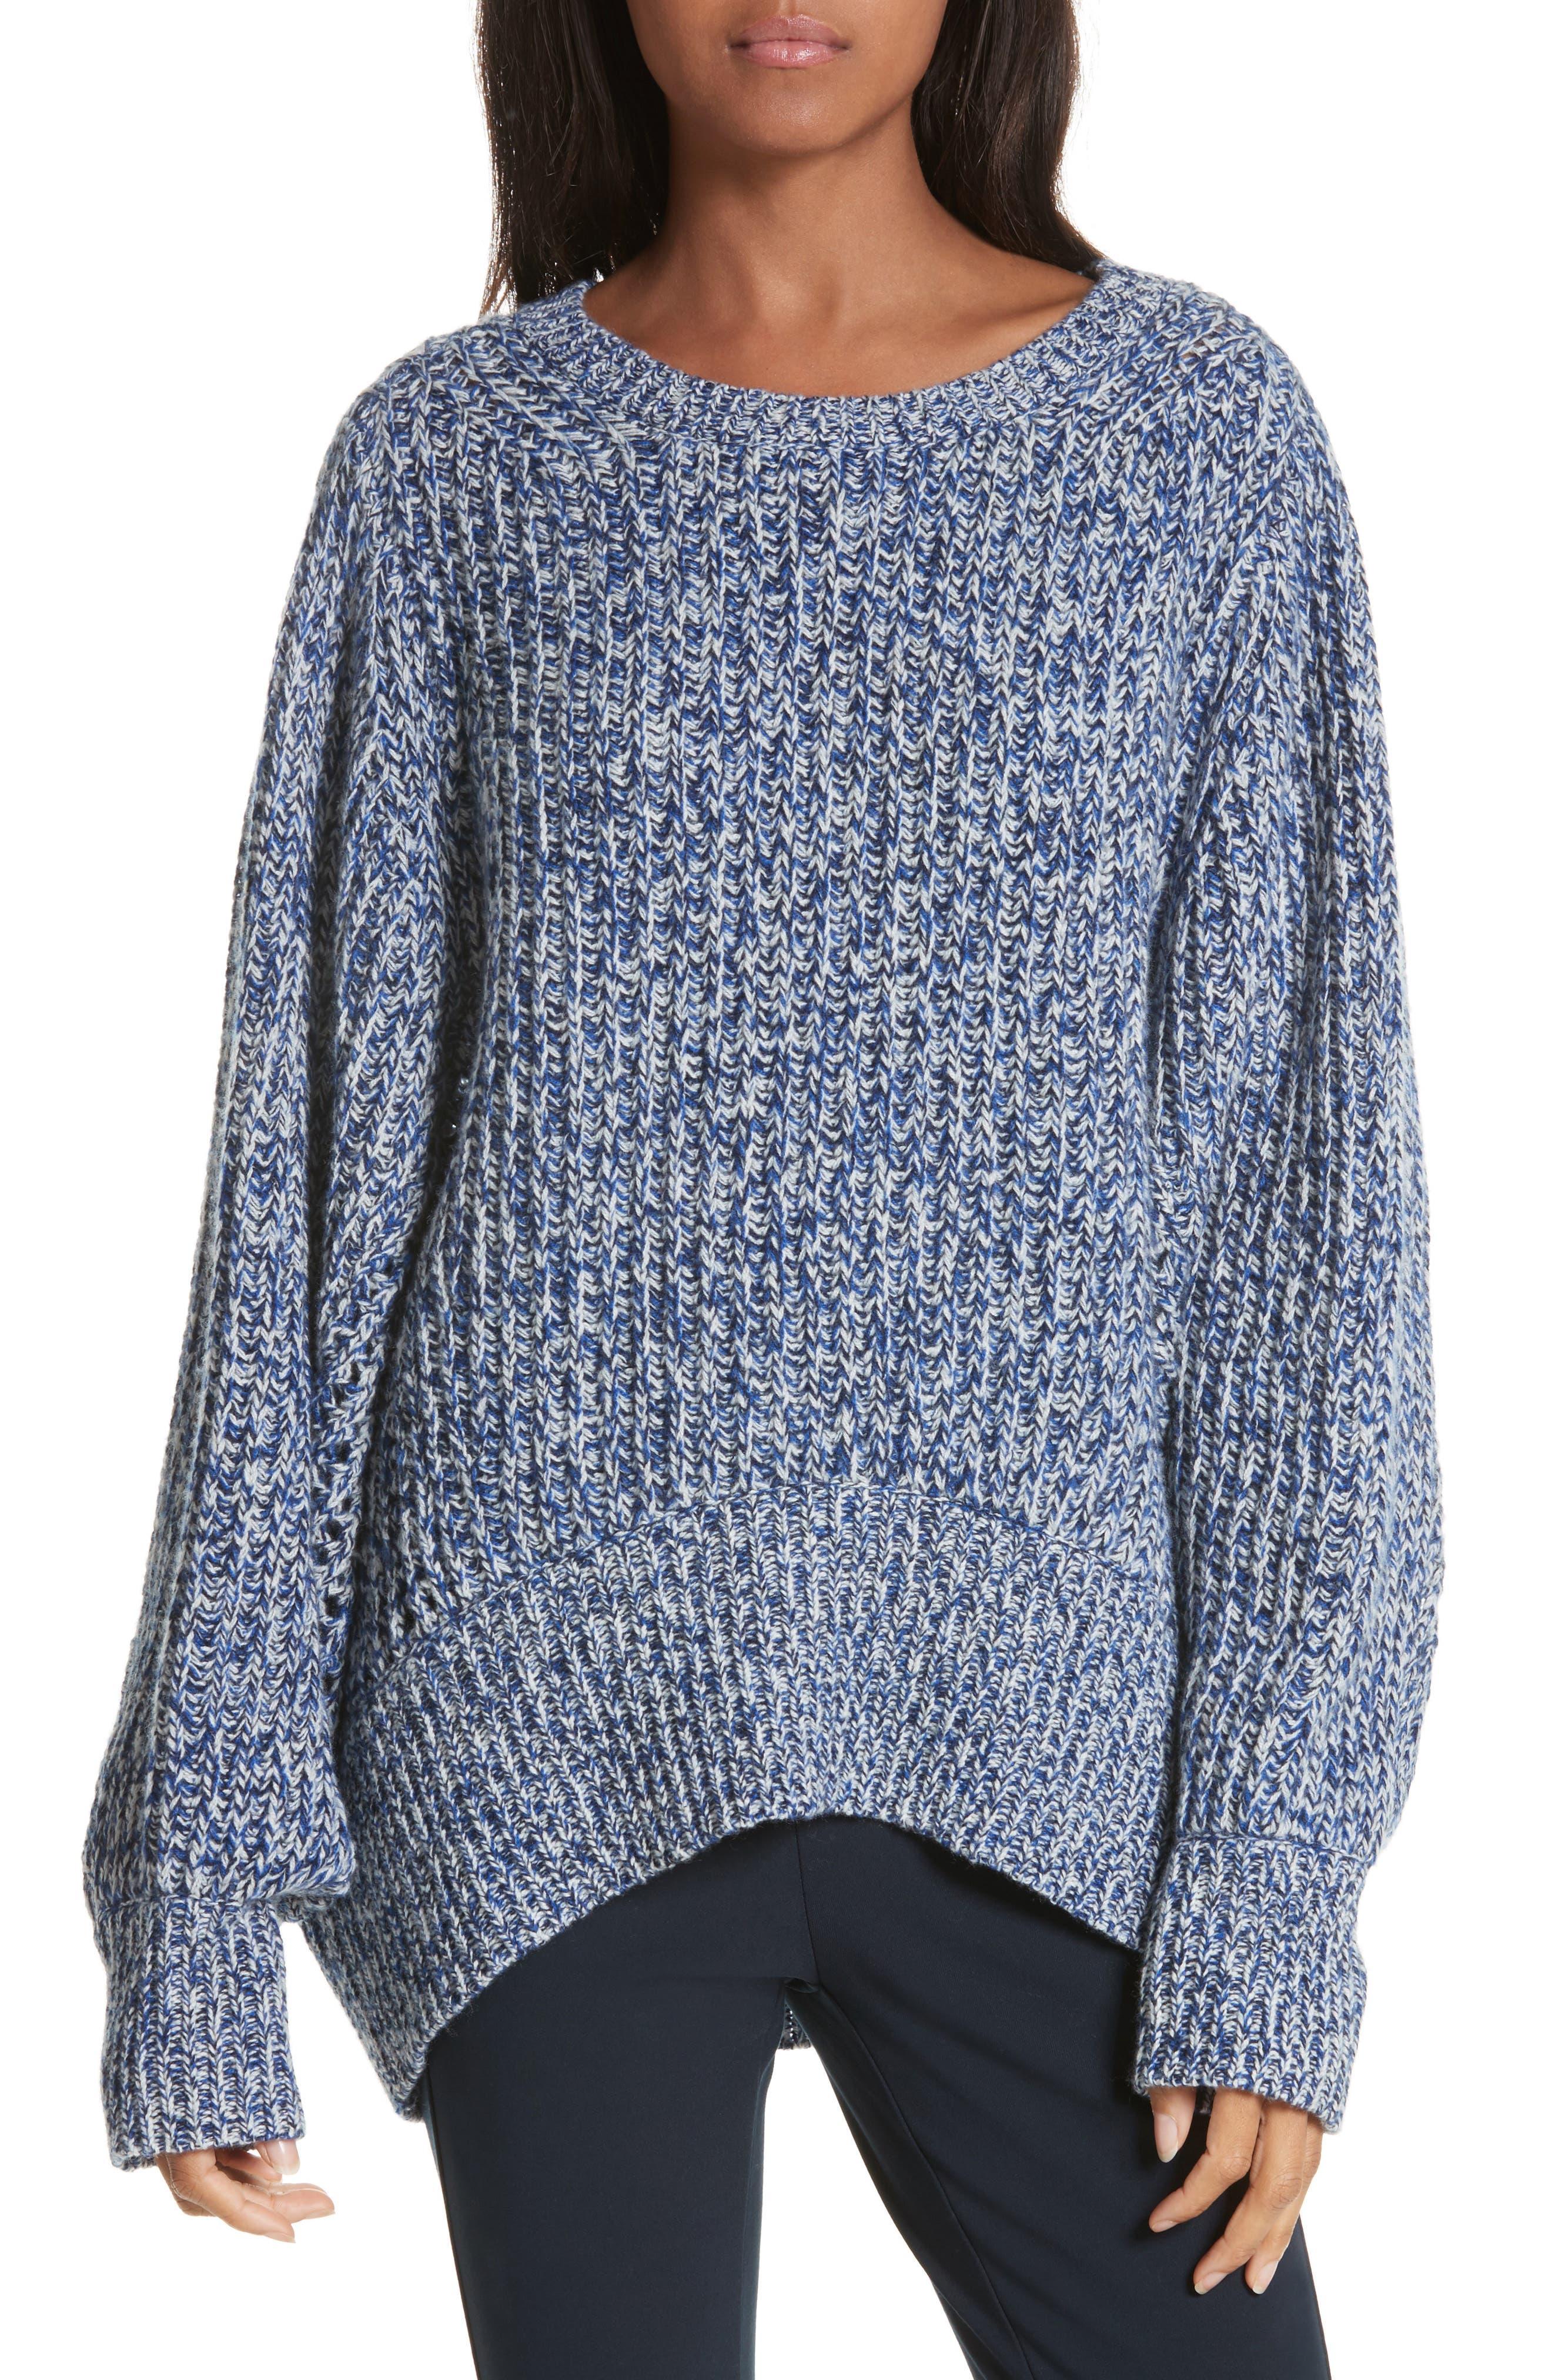 Main Image - rag & bone Athena Cashmere Pullover